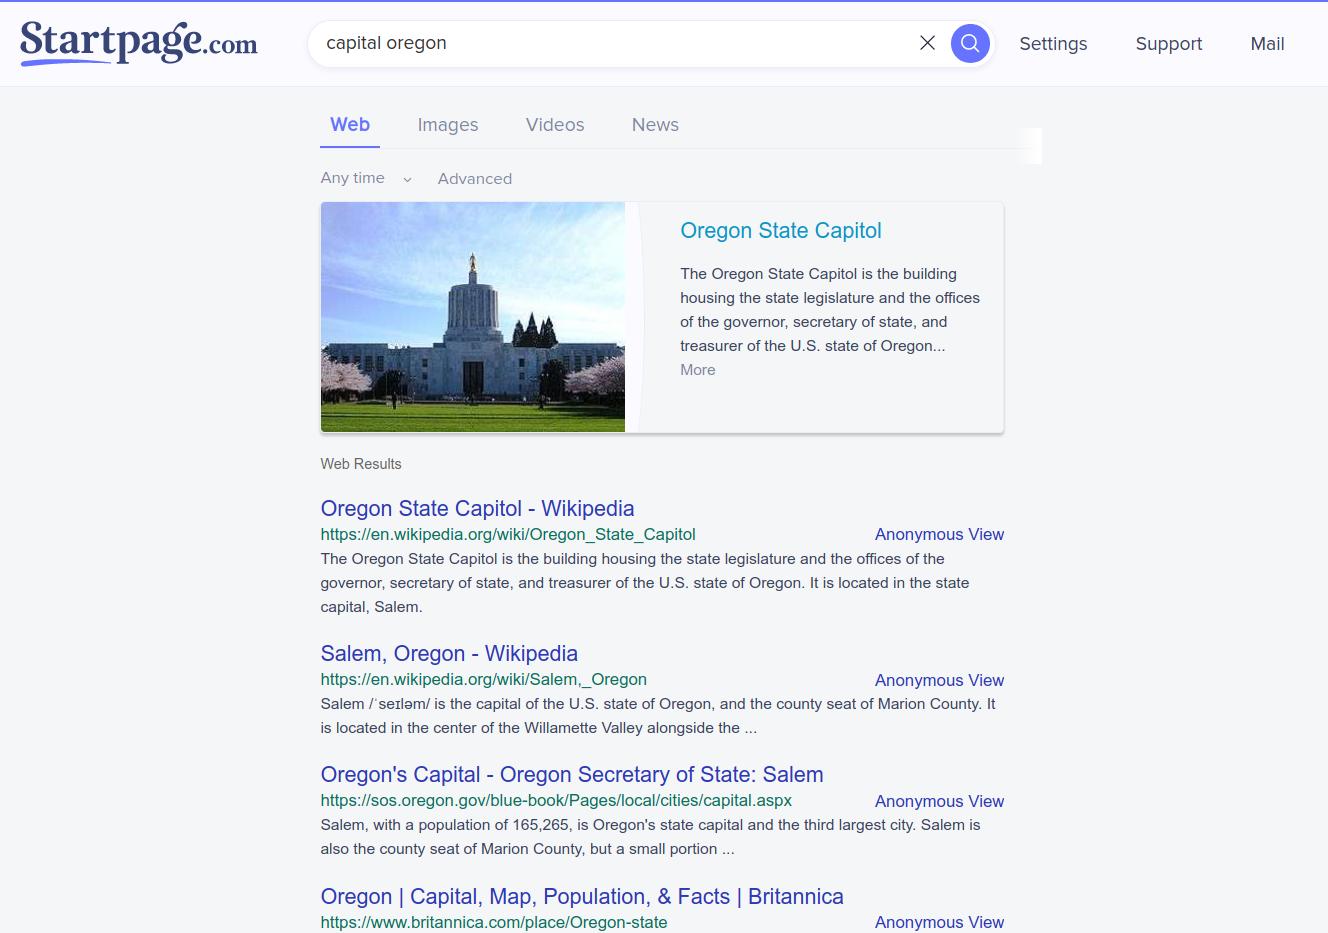 Startpage image